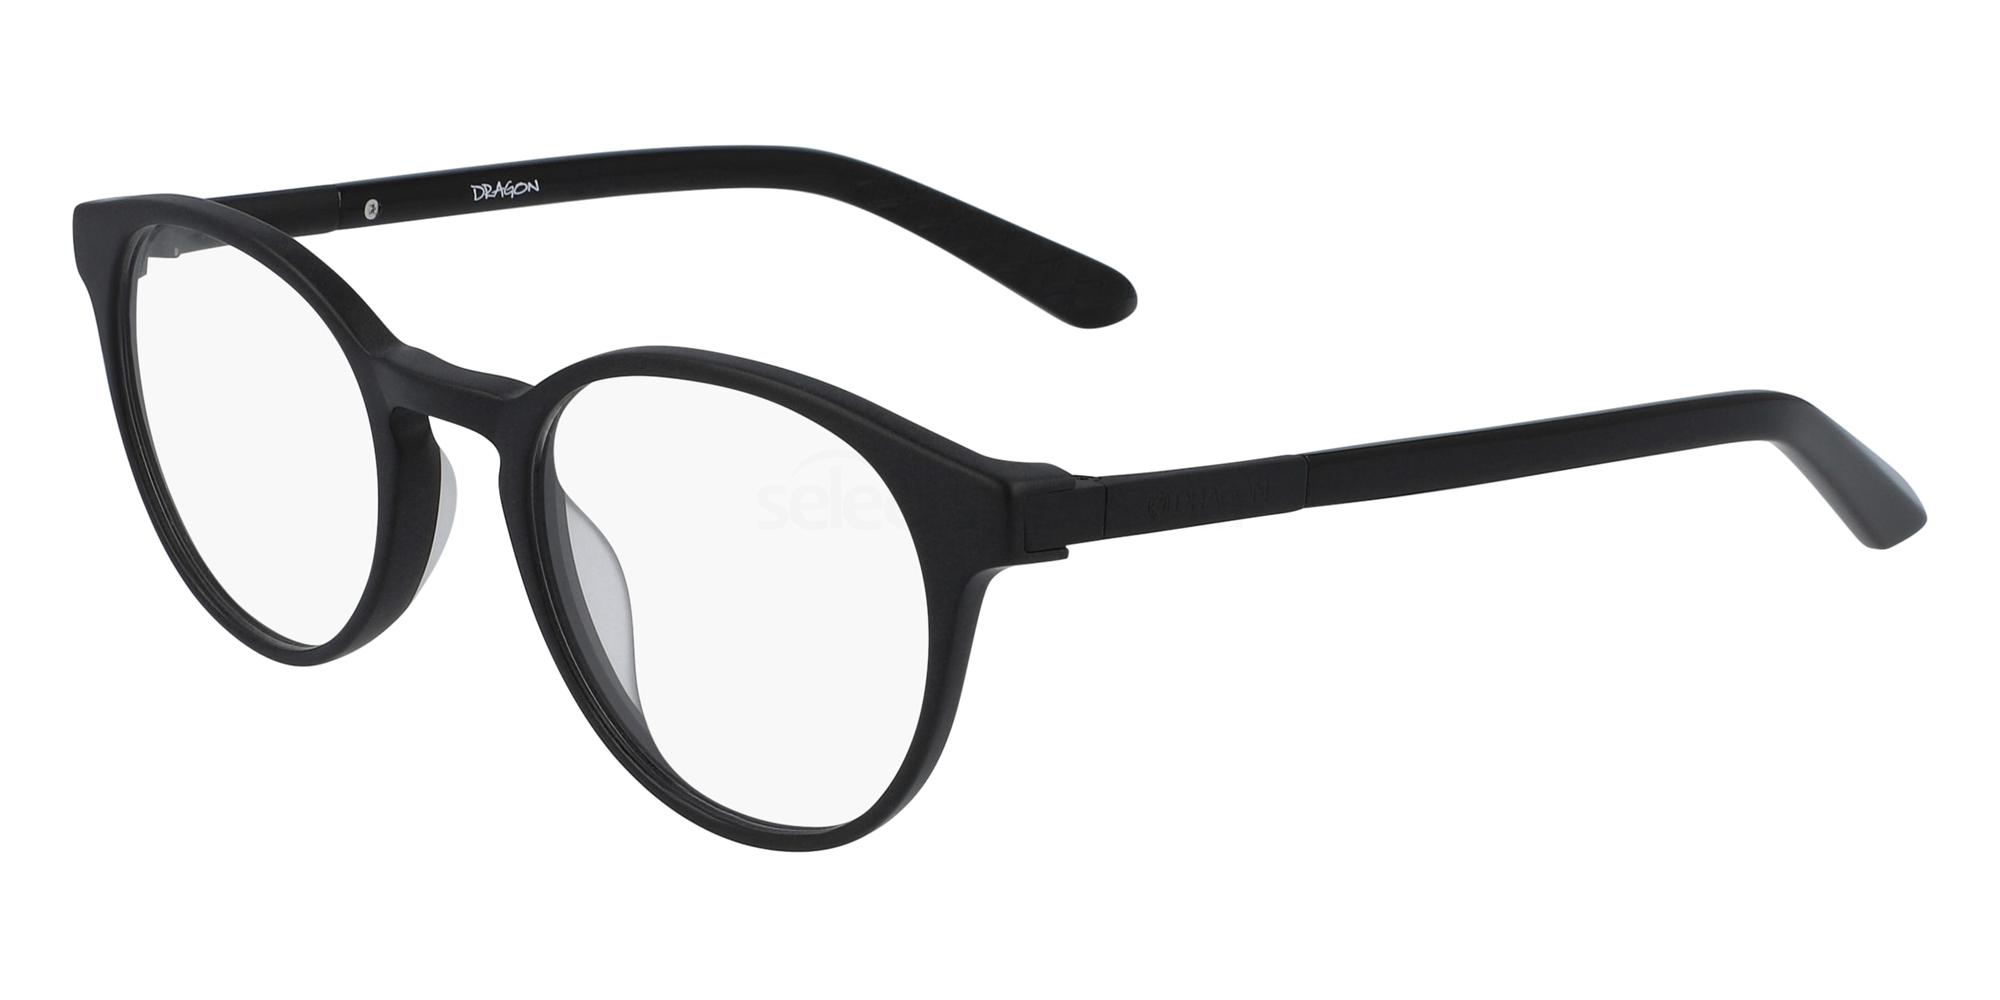 002 DR2013 Glasses, Dragon